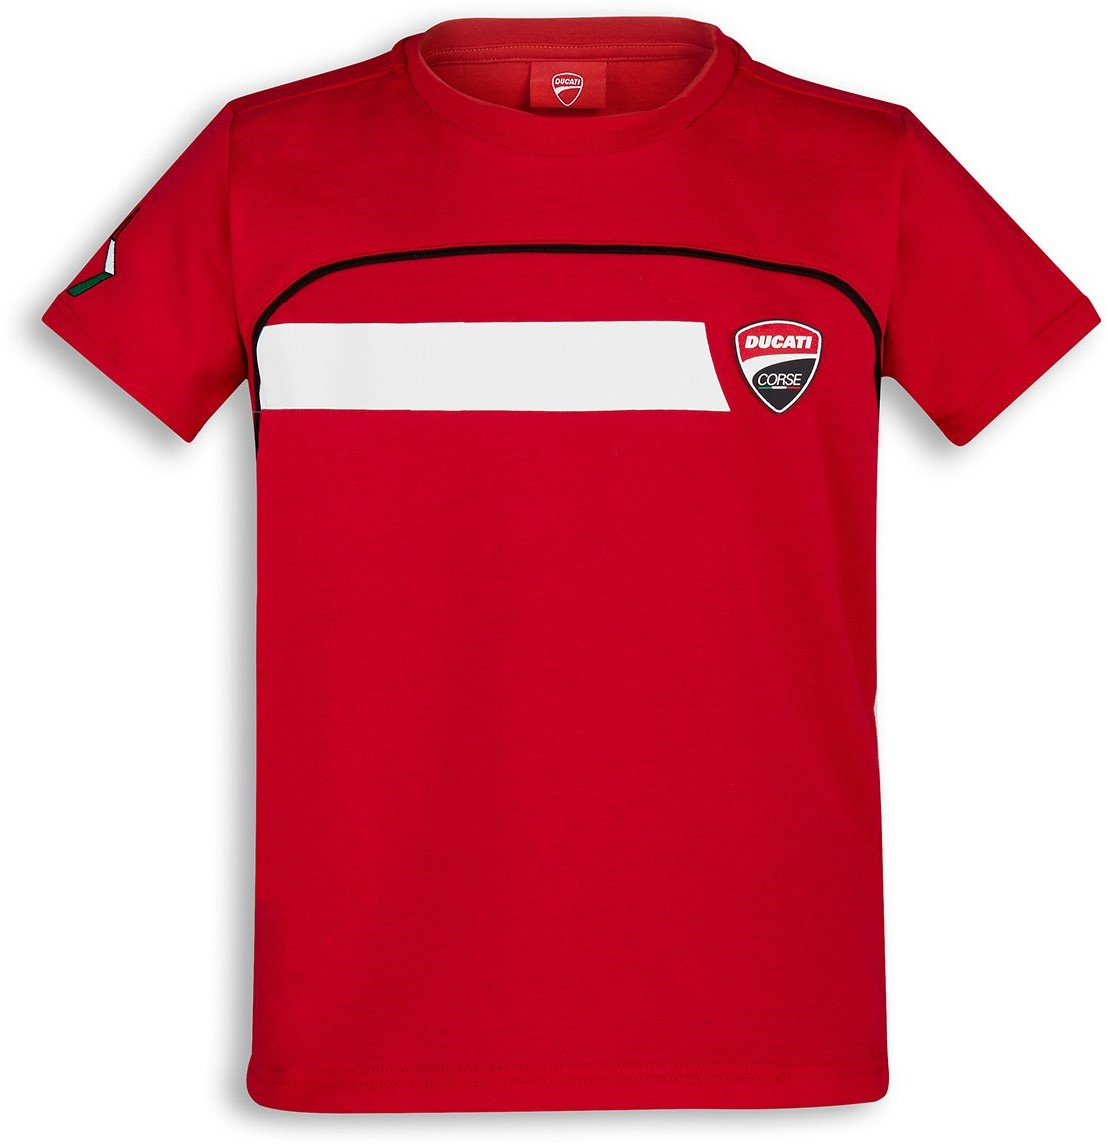 【DUCATI performance】Ducati Corse Speed 兒童 T恤 - 「Webike-摩托百貨」